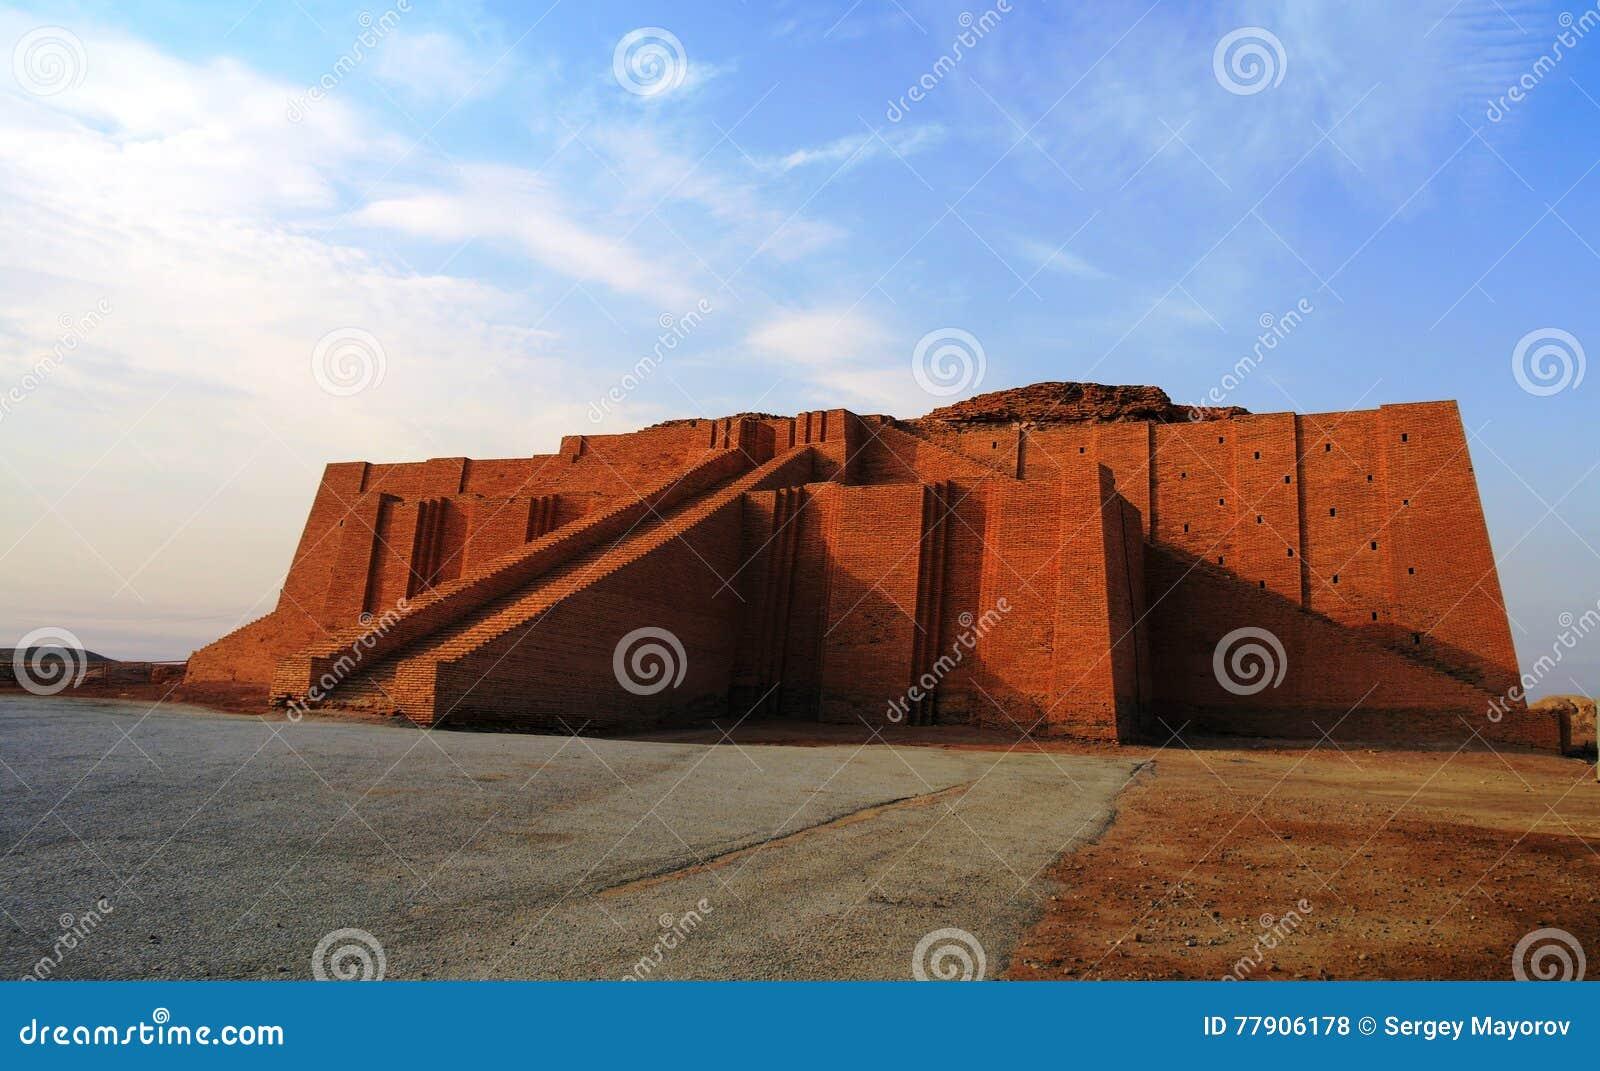 restored ziggurat in ancient ur stock photo image of architecture